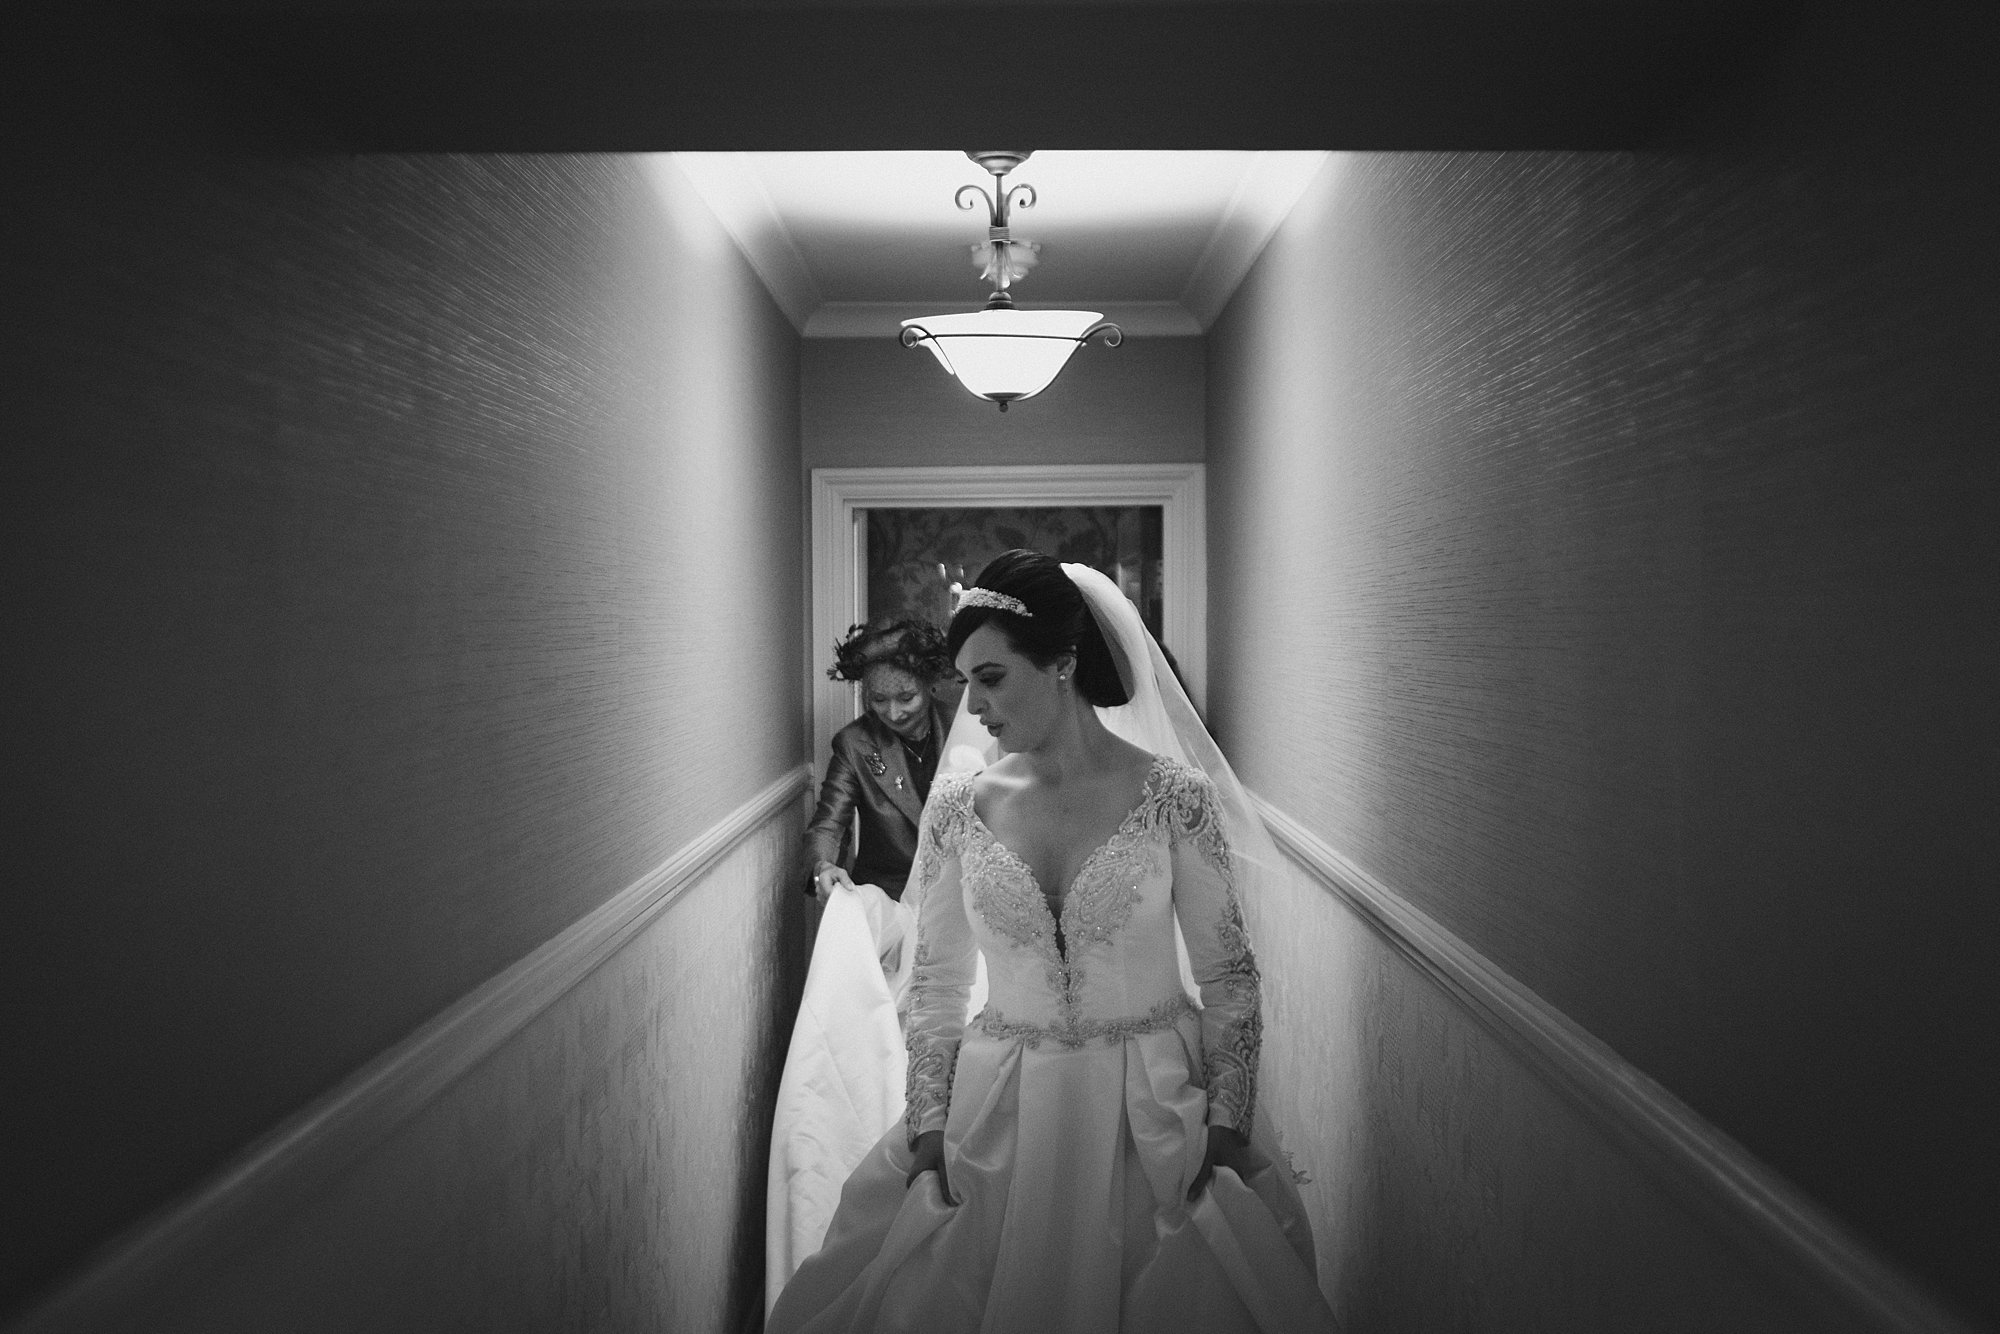 strawberry hill house wedding photographer cc 018 - Strawberry Hill House Wedding Photographer | Charlotte + Cristiano